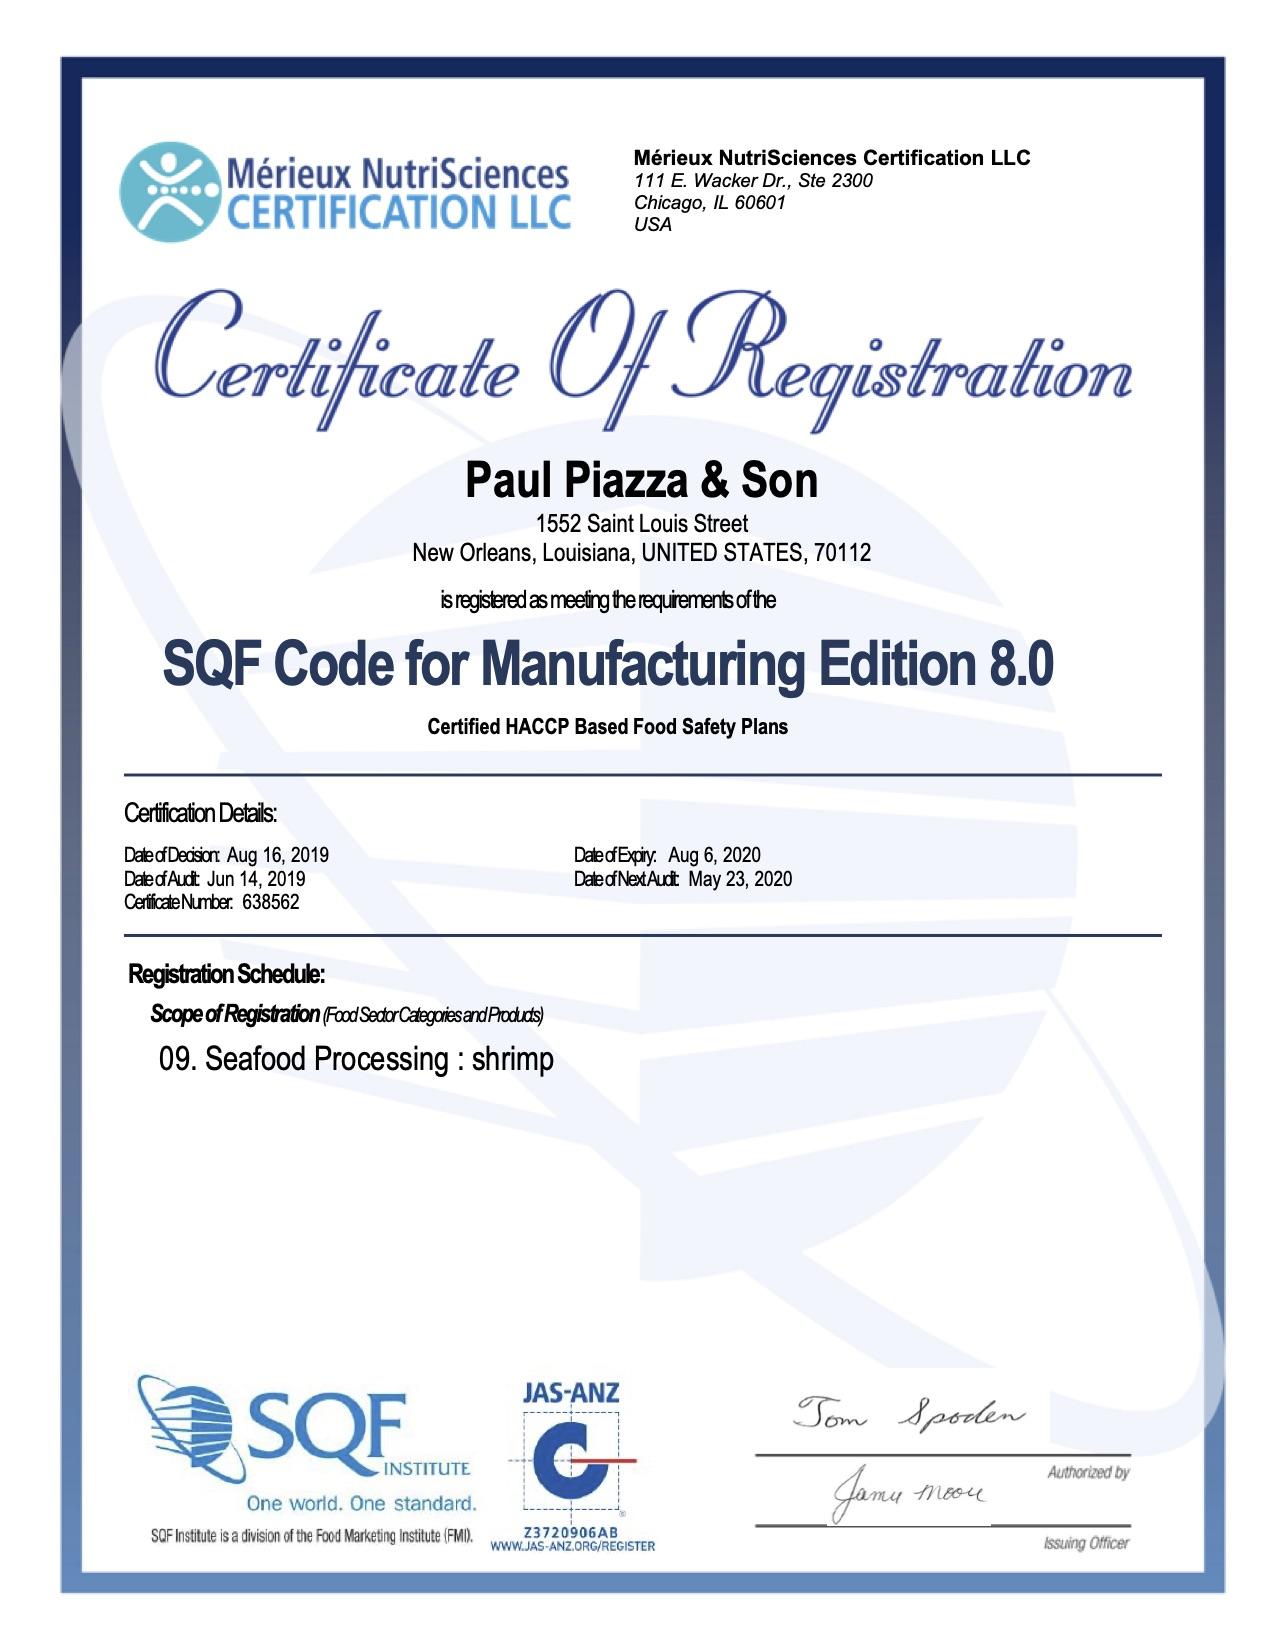 sqf piazza paul certification score receives highest possible plants both sons shrimp